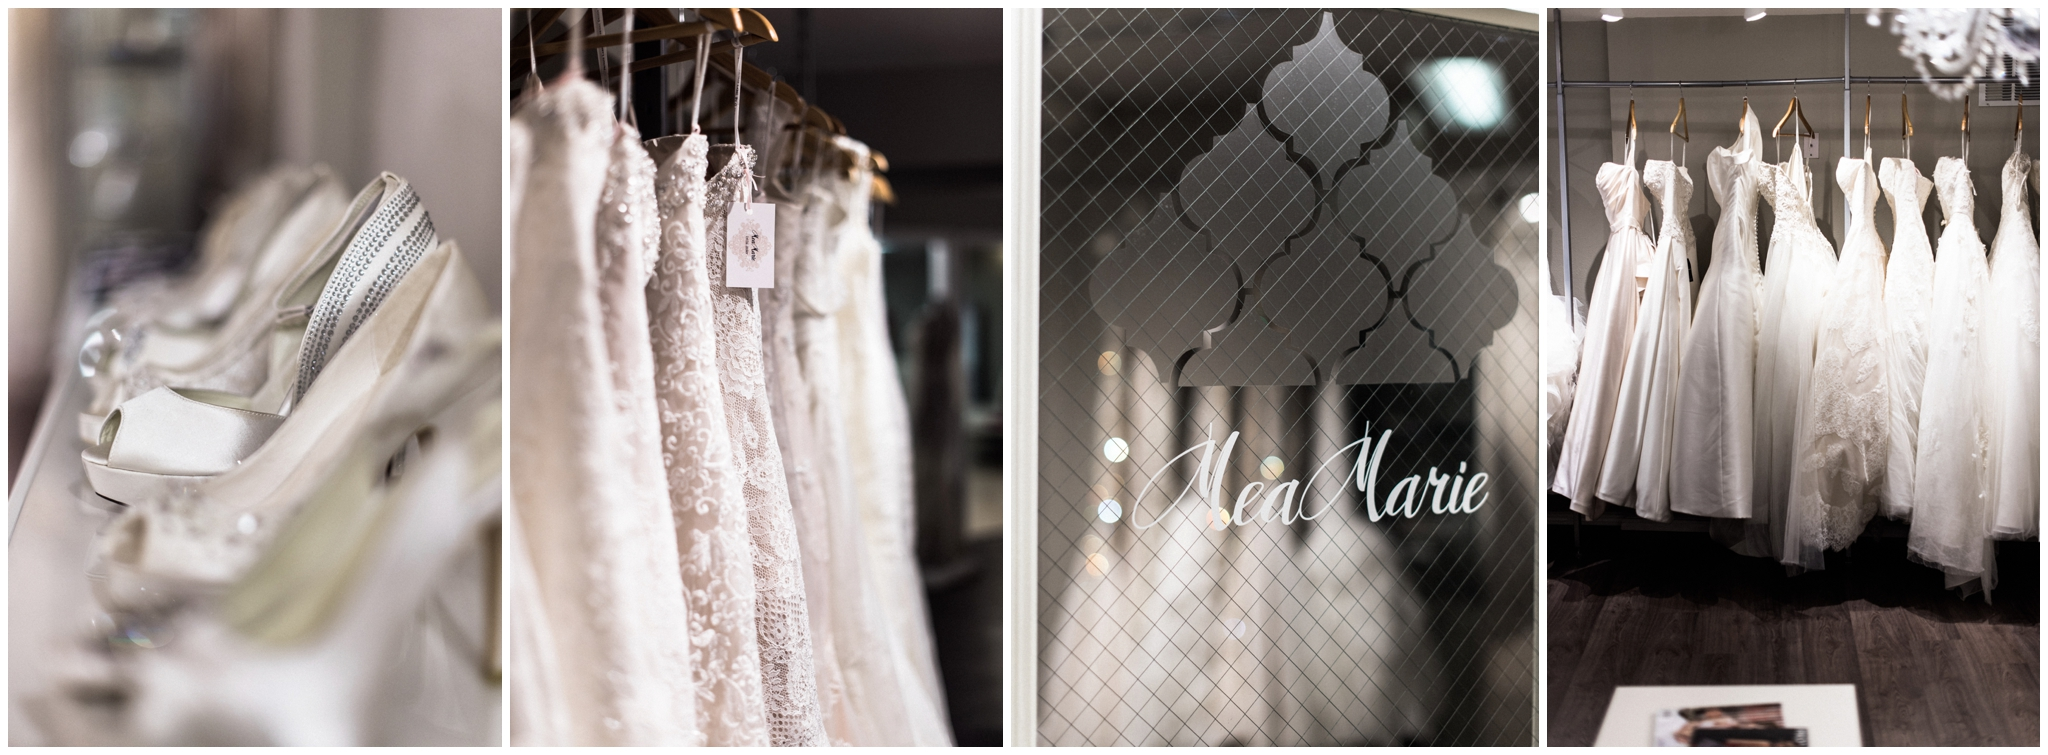 MeaMarie Bridal Atelier. Seattle Wedding Dress Shopping. B. Jones Photography. Seattle Wedding Photographer.